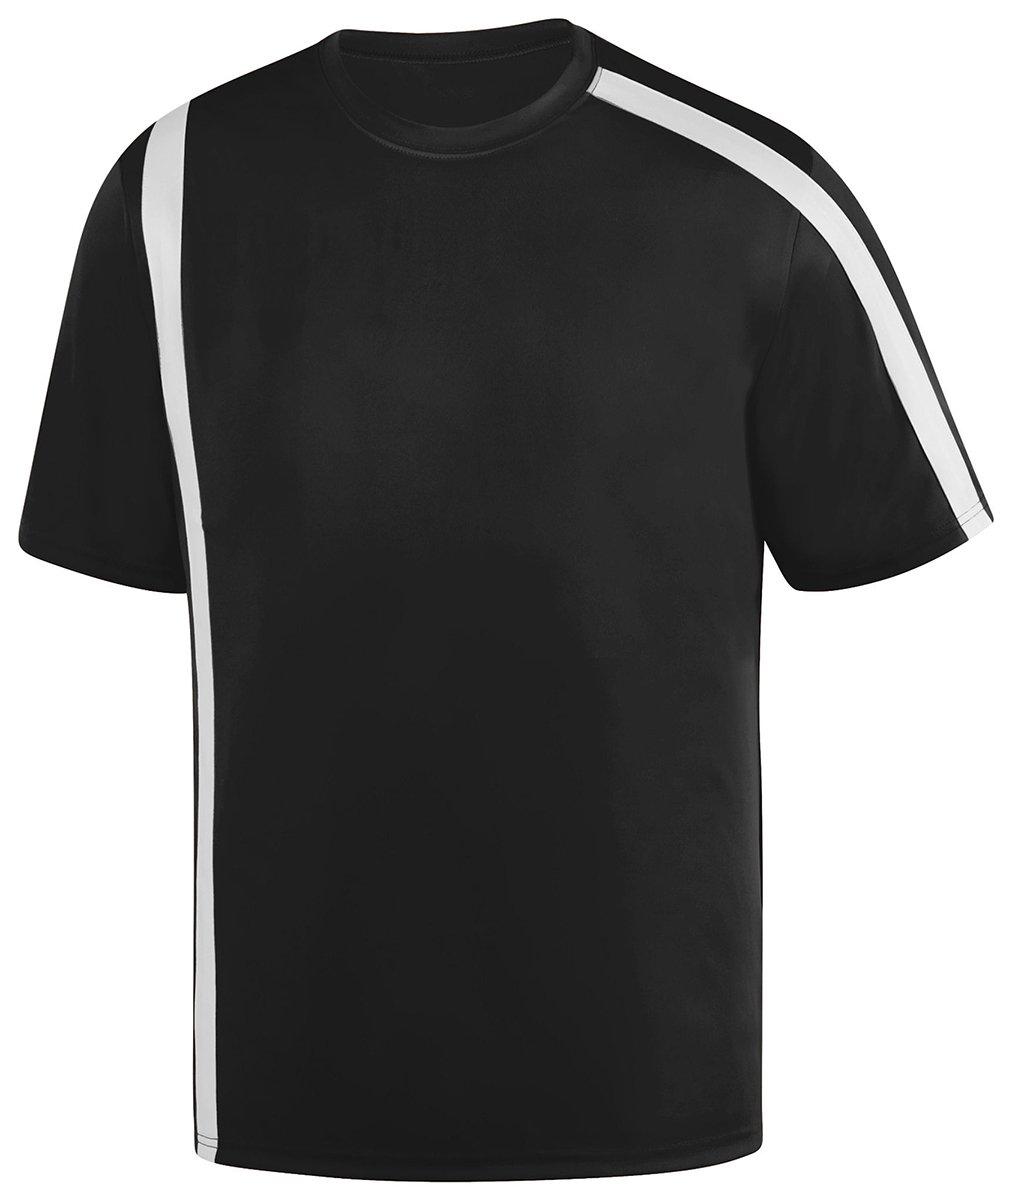 Augusta SportswearメンズAttacking Third Jersey B01DQ7GW6O Large|ブラック/ホワイト ブラック/ホワイト Large